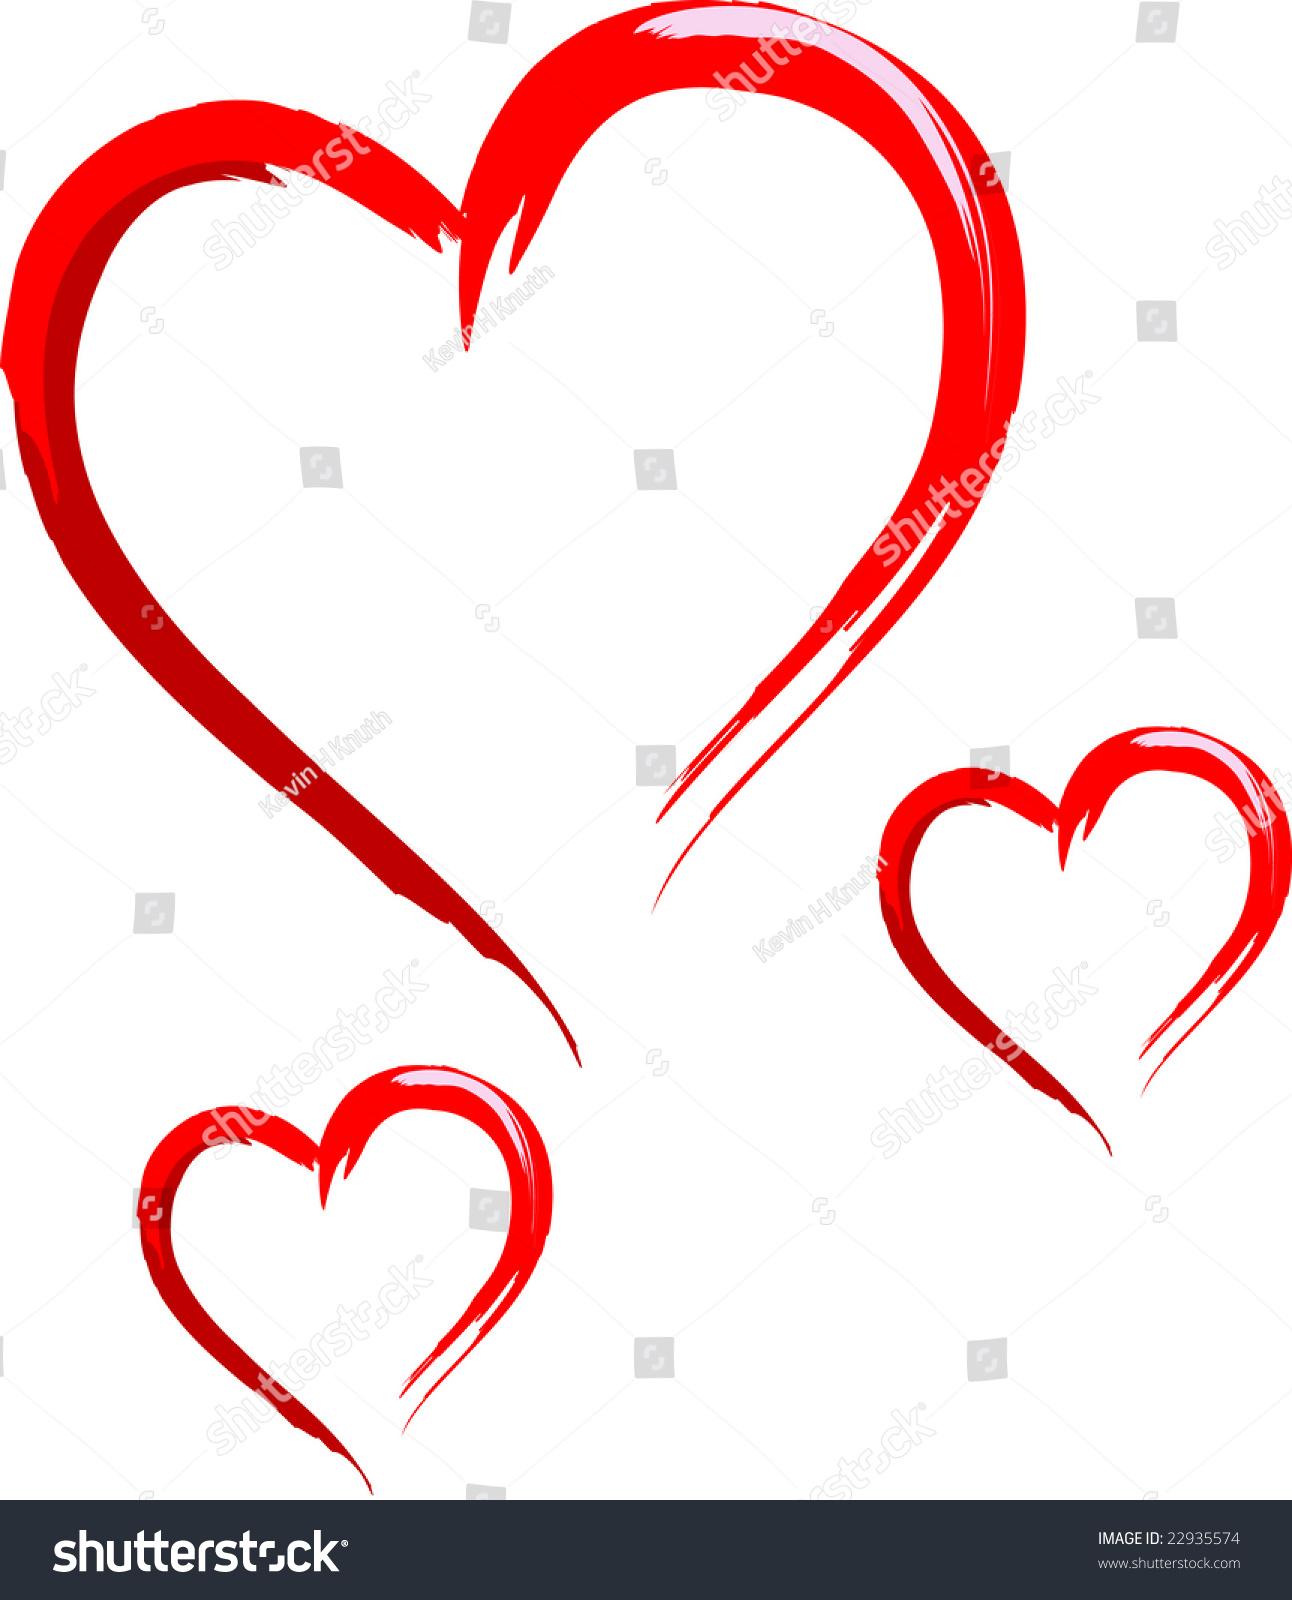 Three sketched hearts stock vector 22935574 shutterstock three sketched hearts buycottarizona